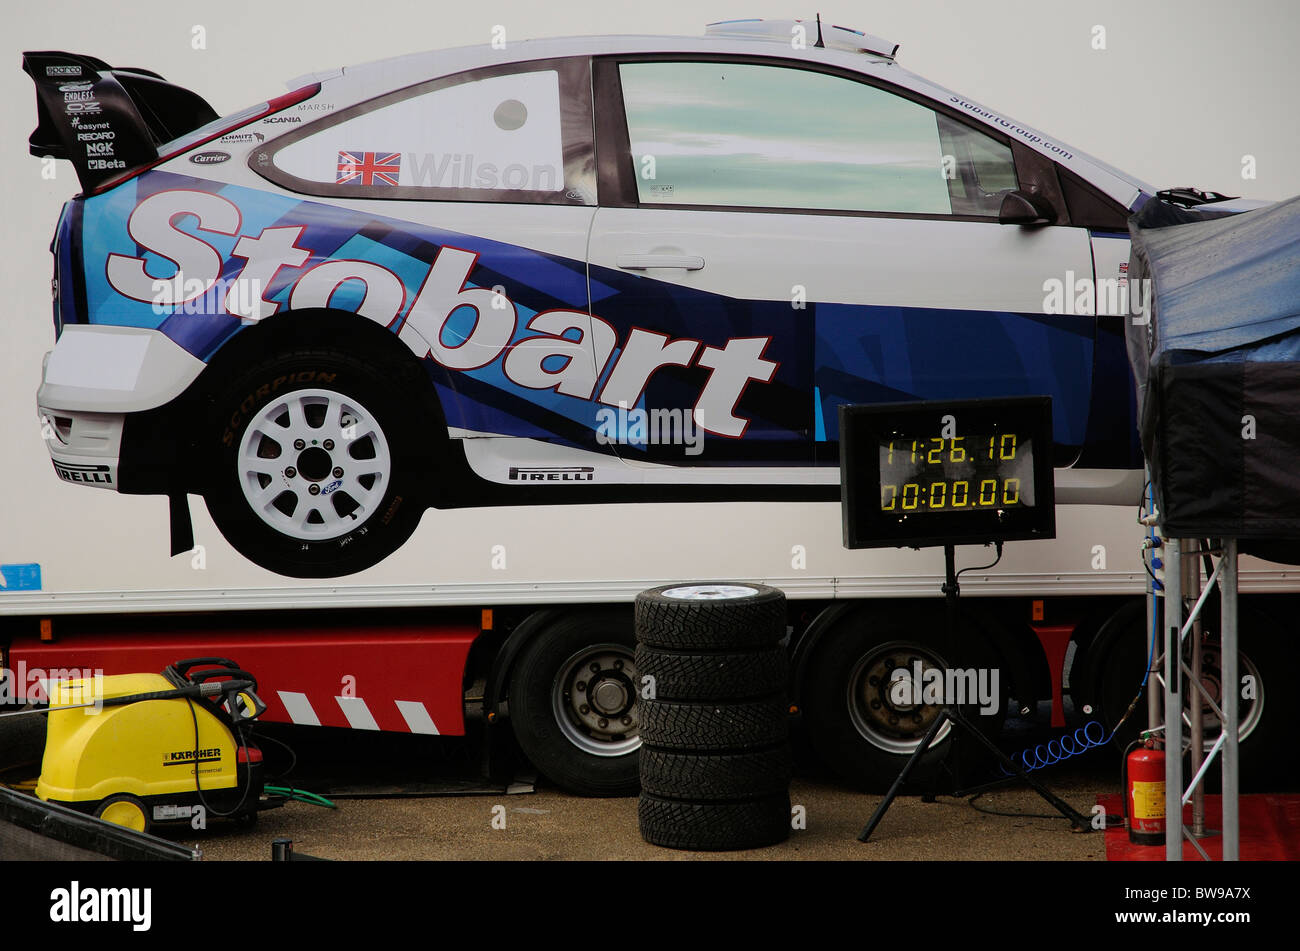 Stobart motor sport truck rally team transports Photo Stock